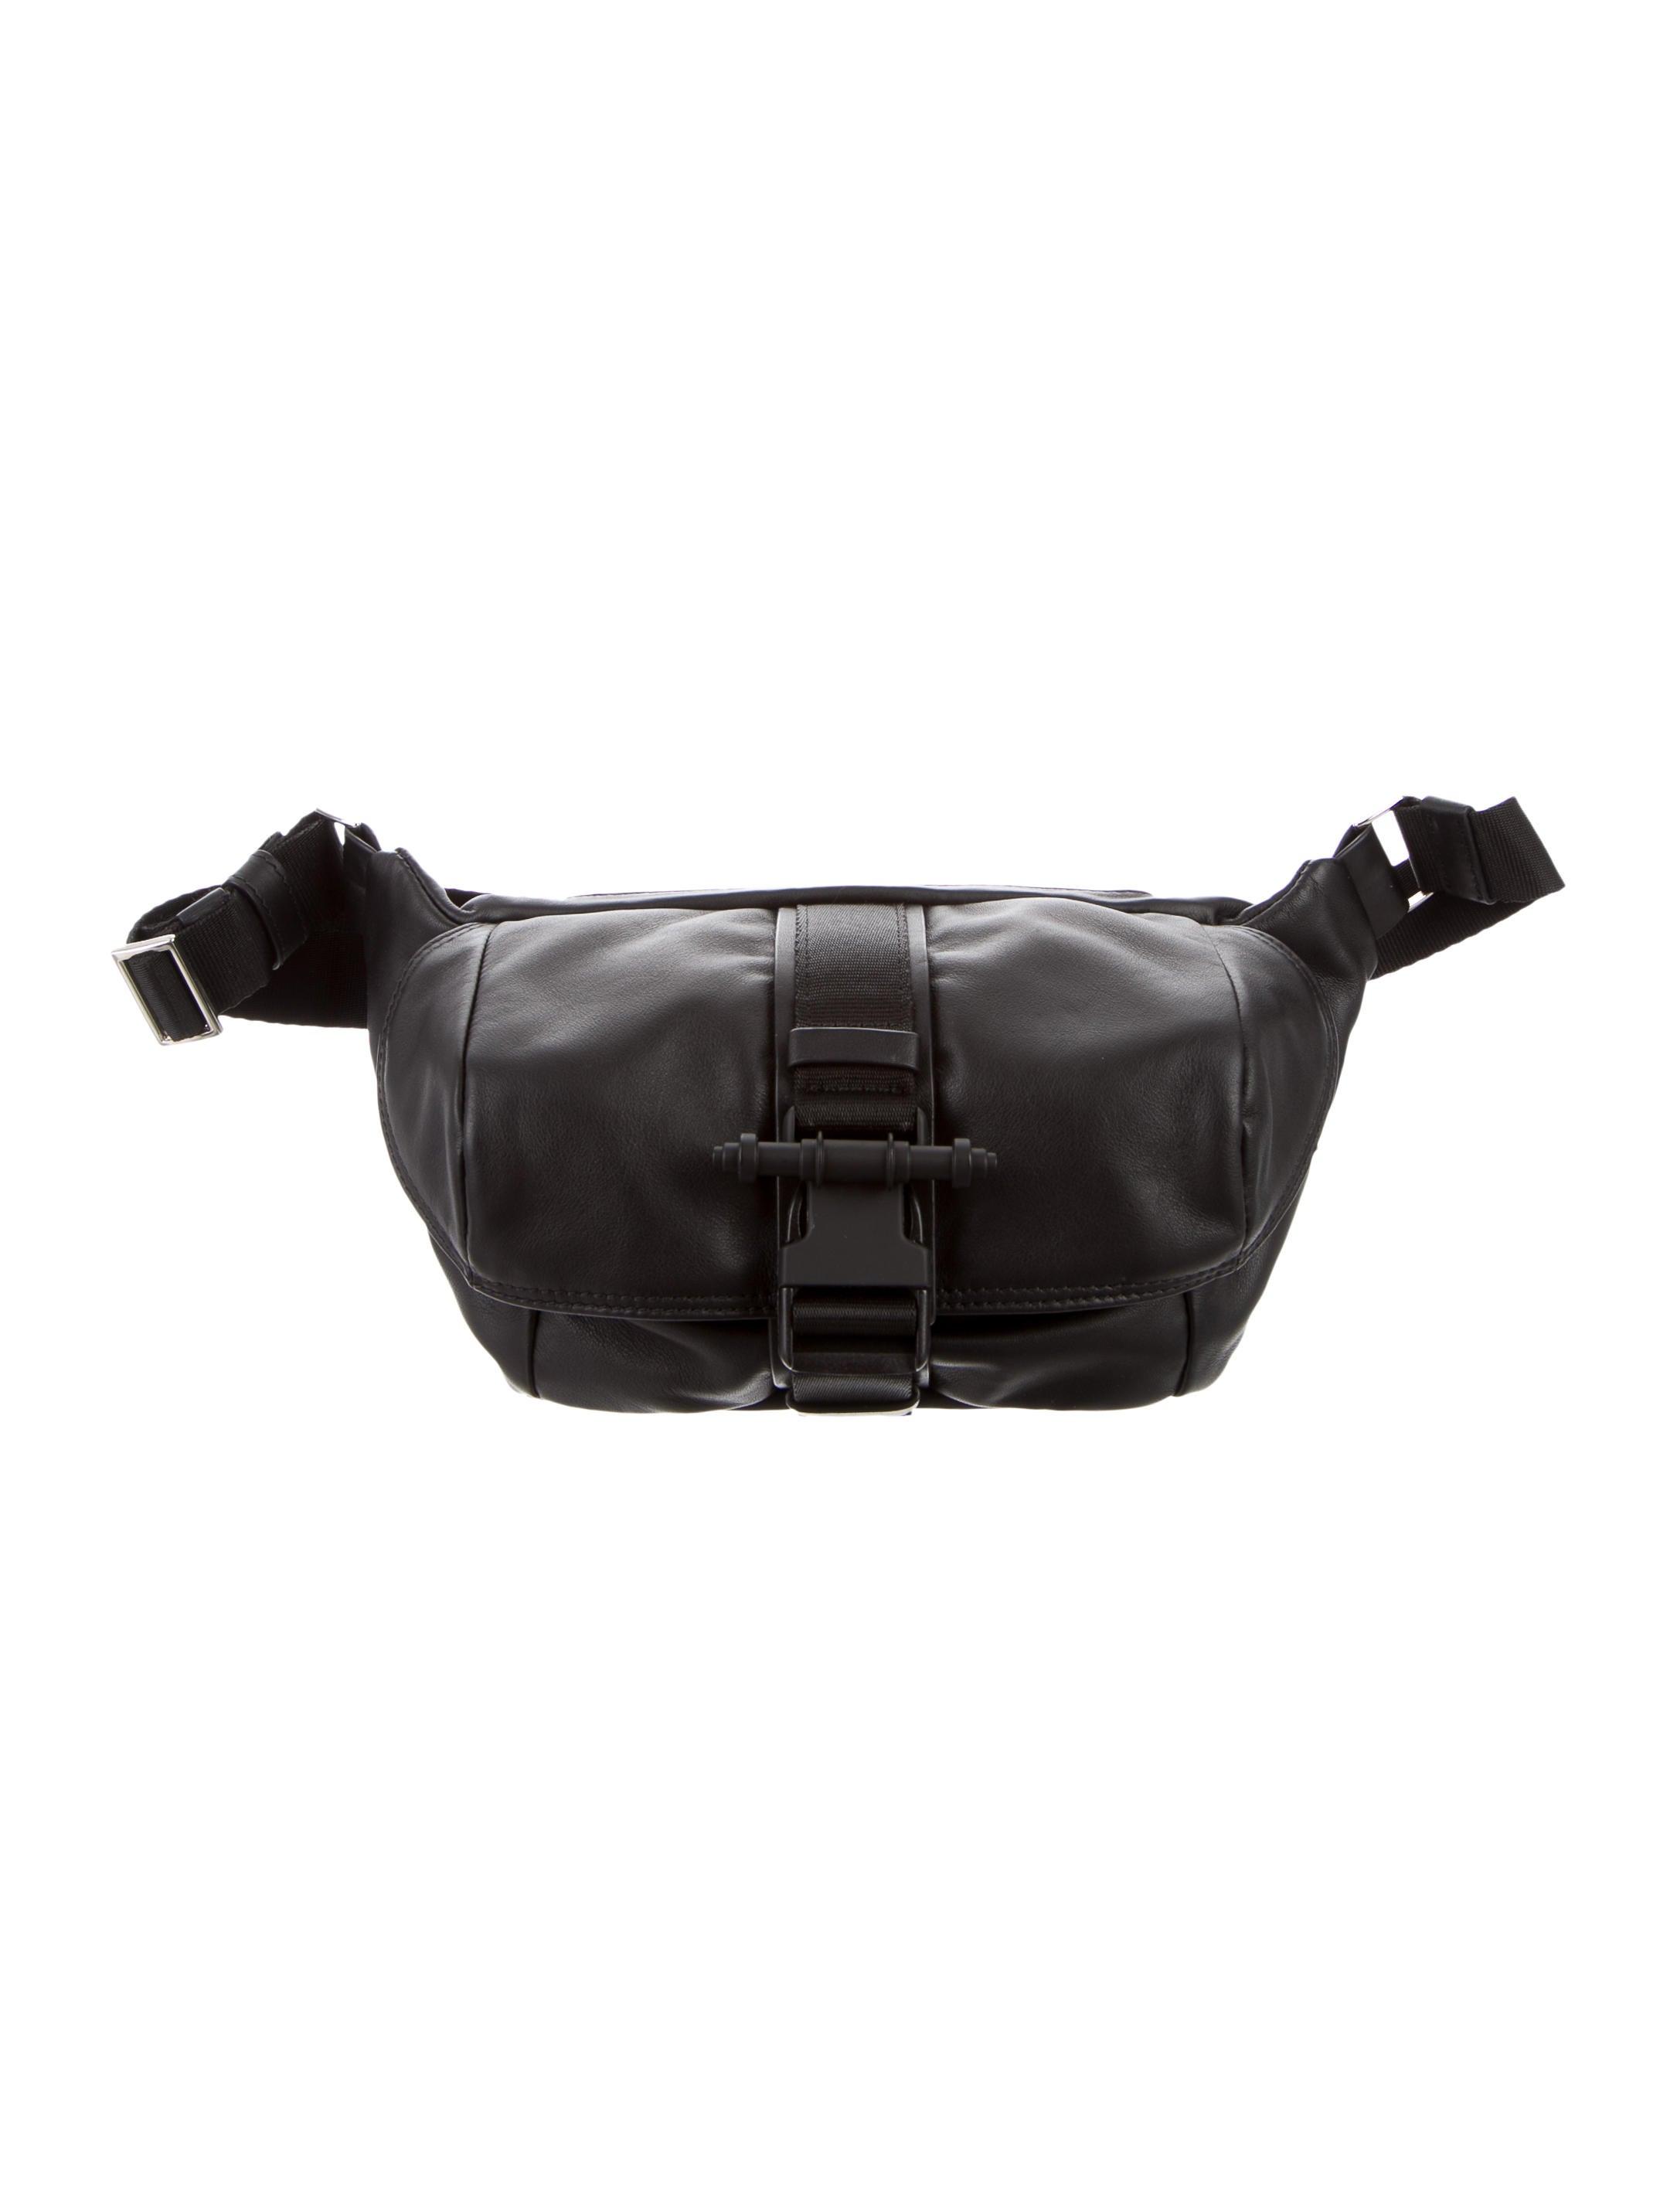 Givenchy Obsedia Bum Bag w  Tags - Bags - GIV33683  af8ccd2f4a325